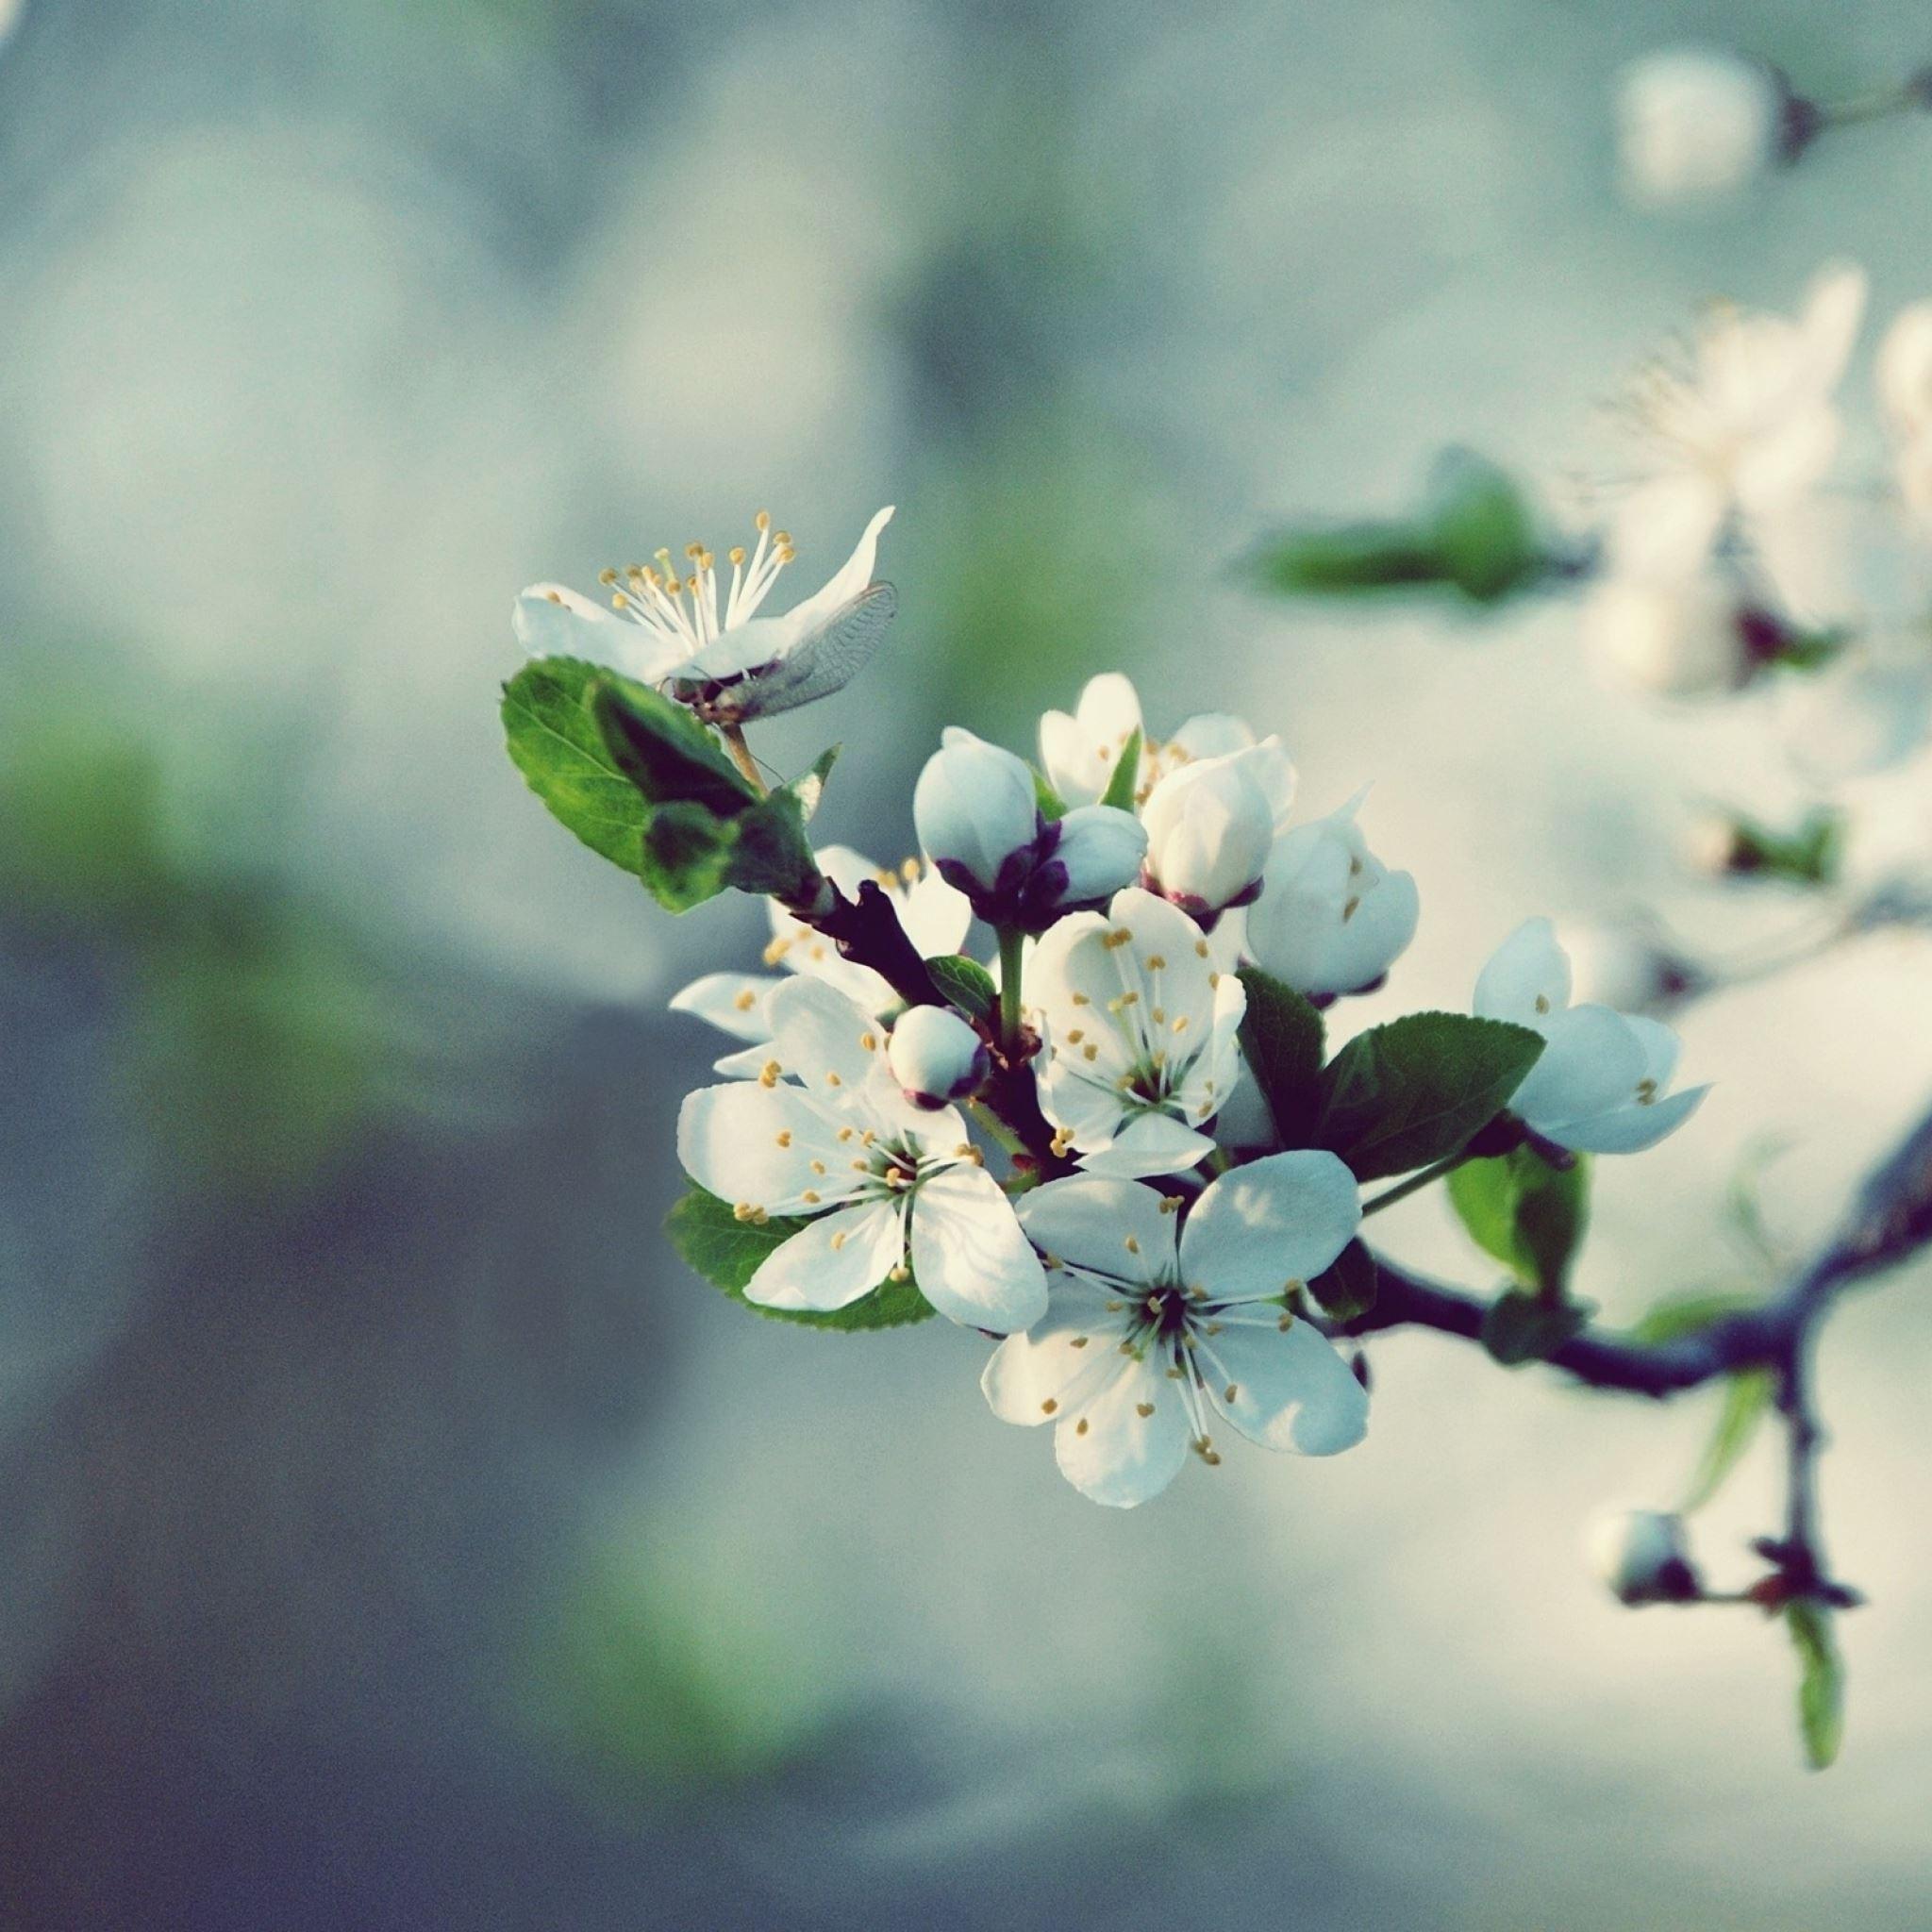 Flowering branch spring tree iPad Air wallpaper